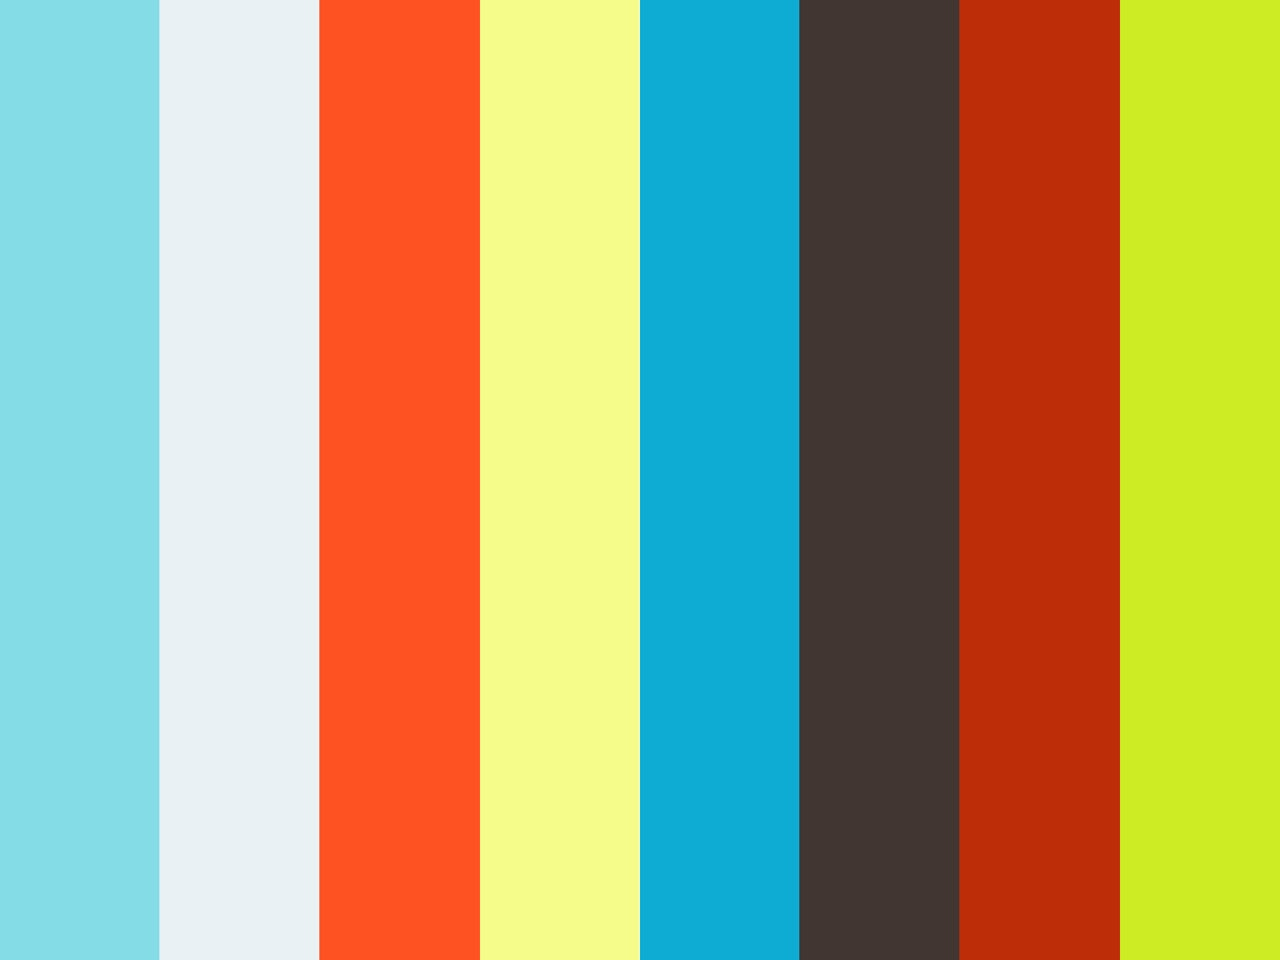 New Makerspace & Digital Media Studios for Summer 2017!